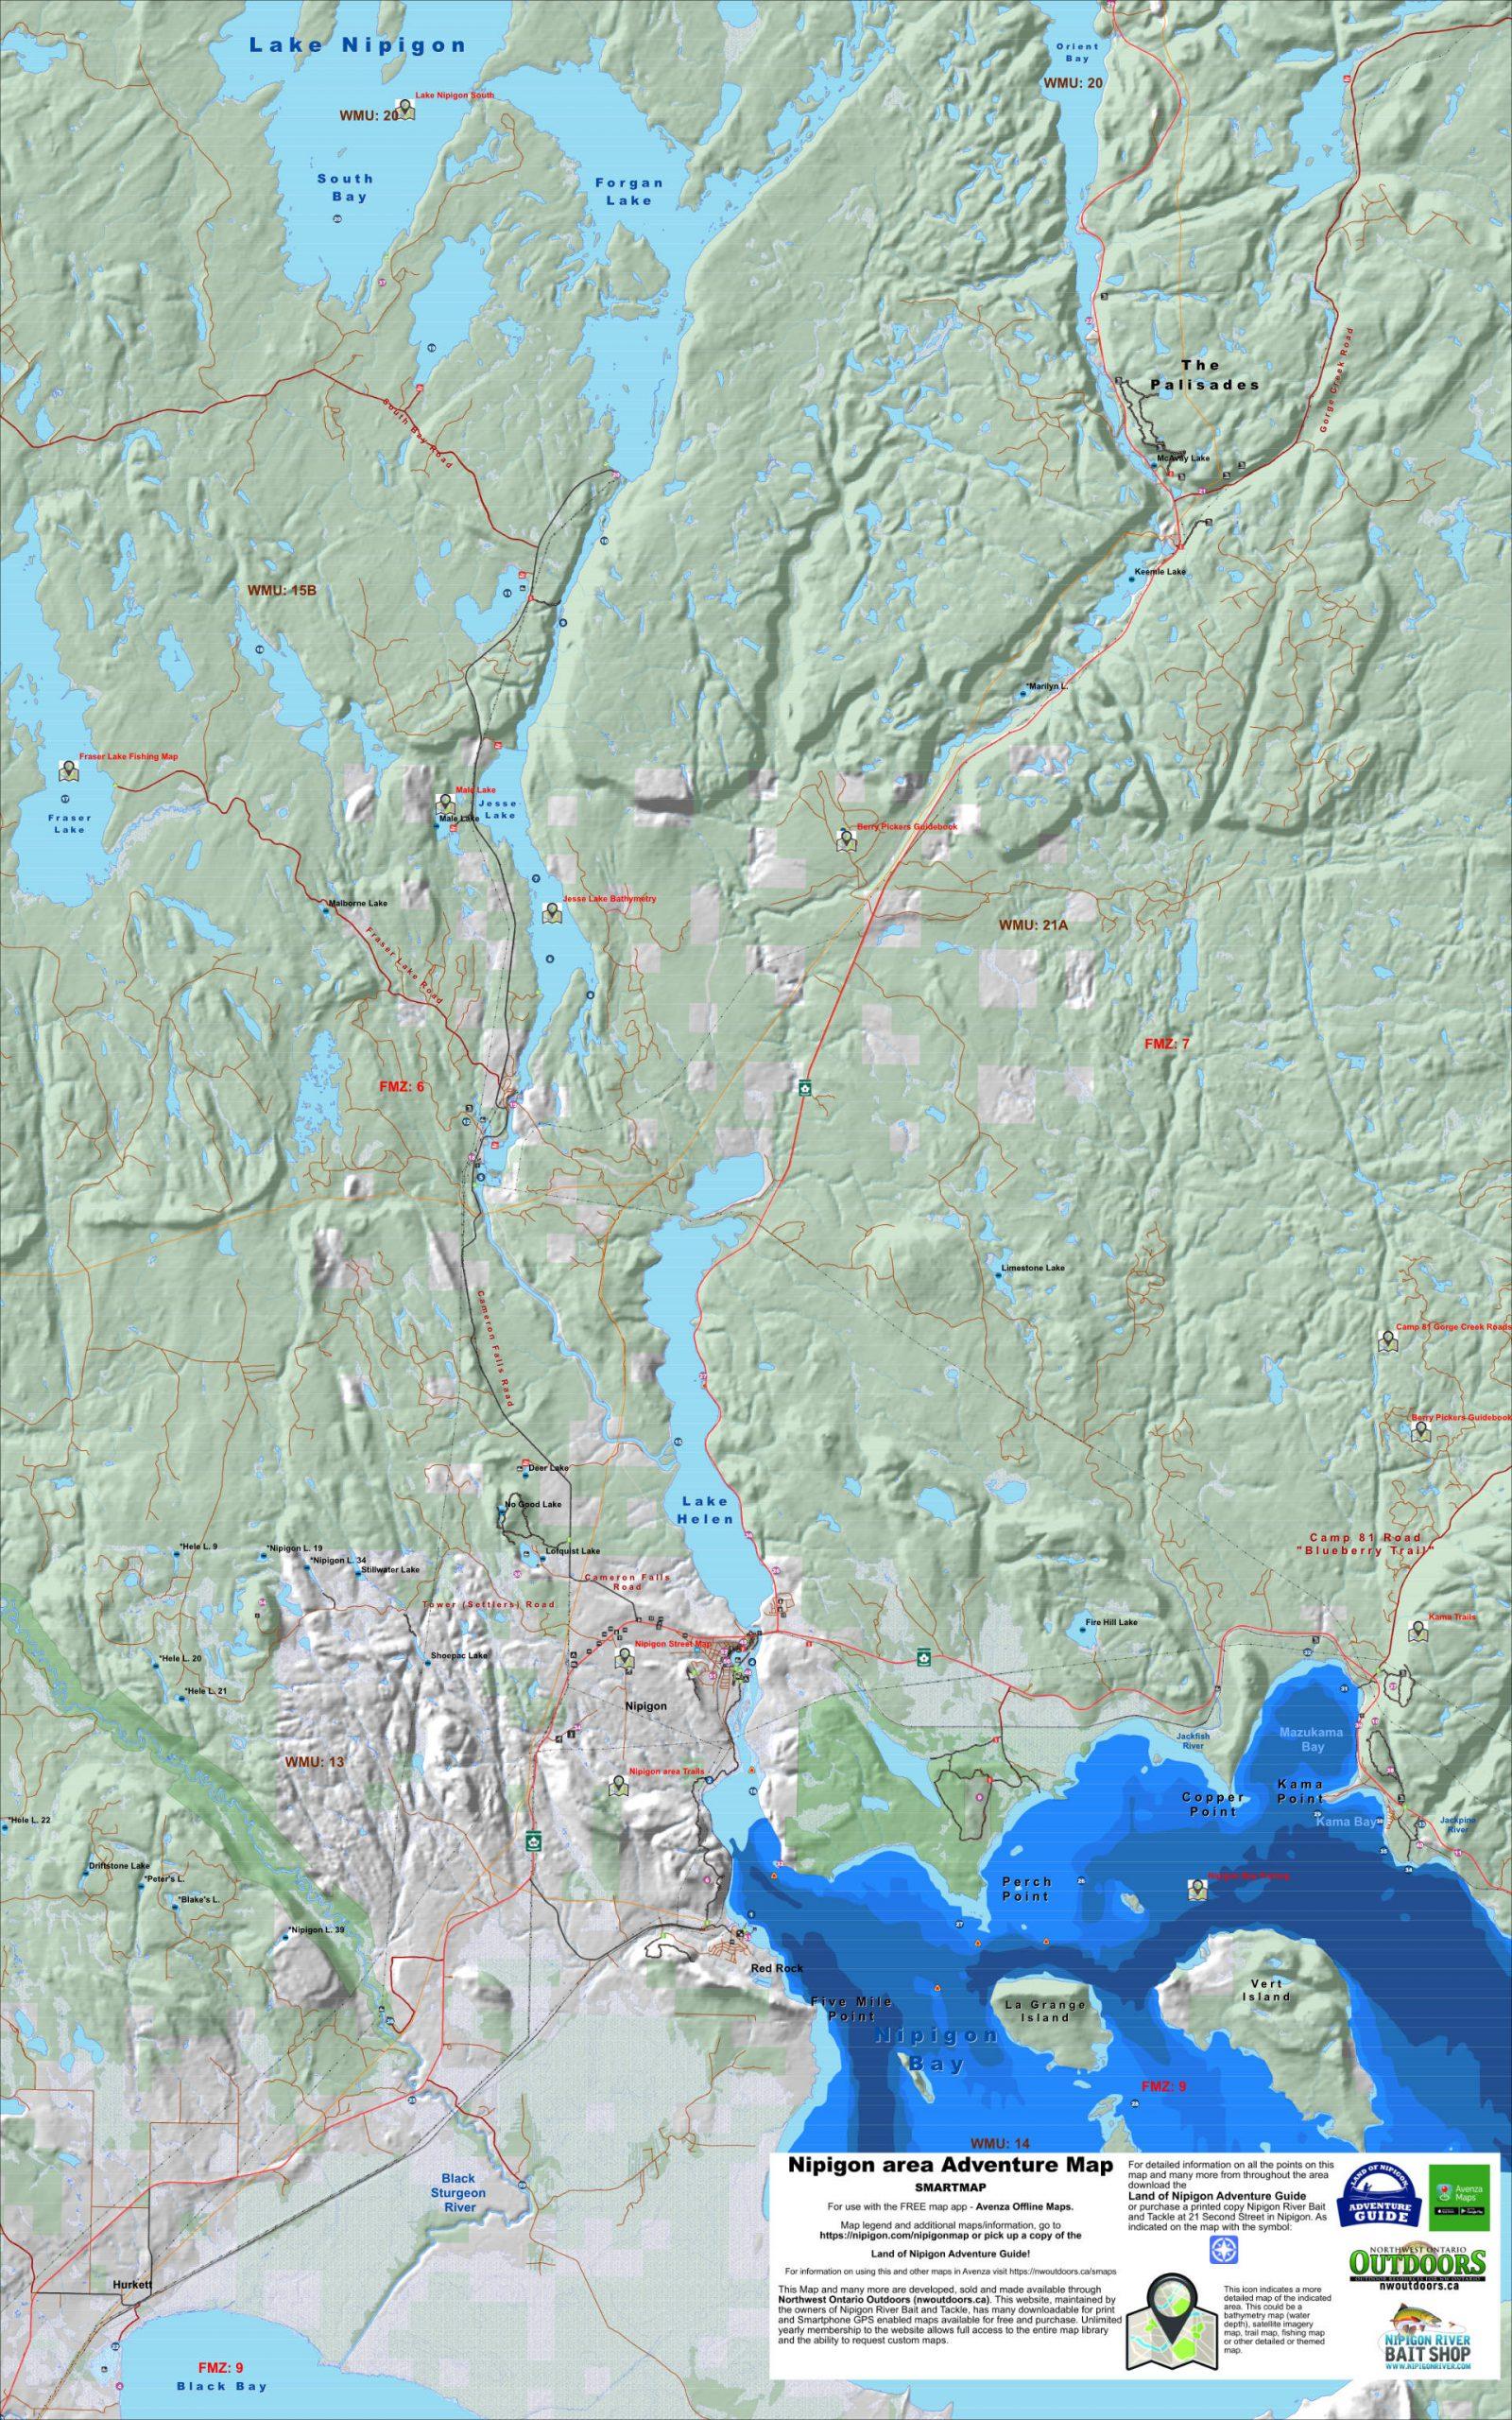 Nipigon area map